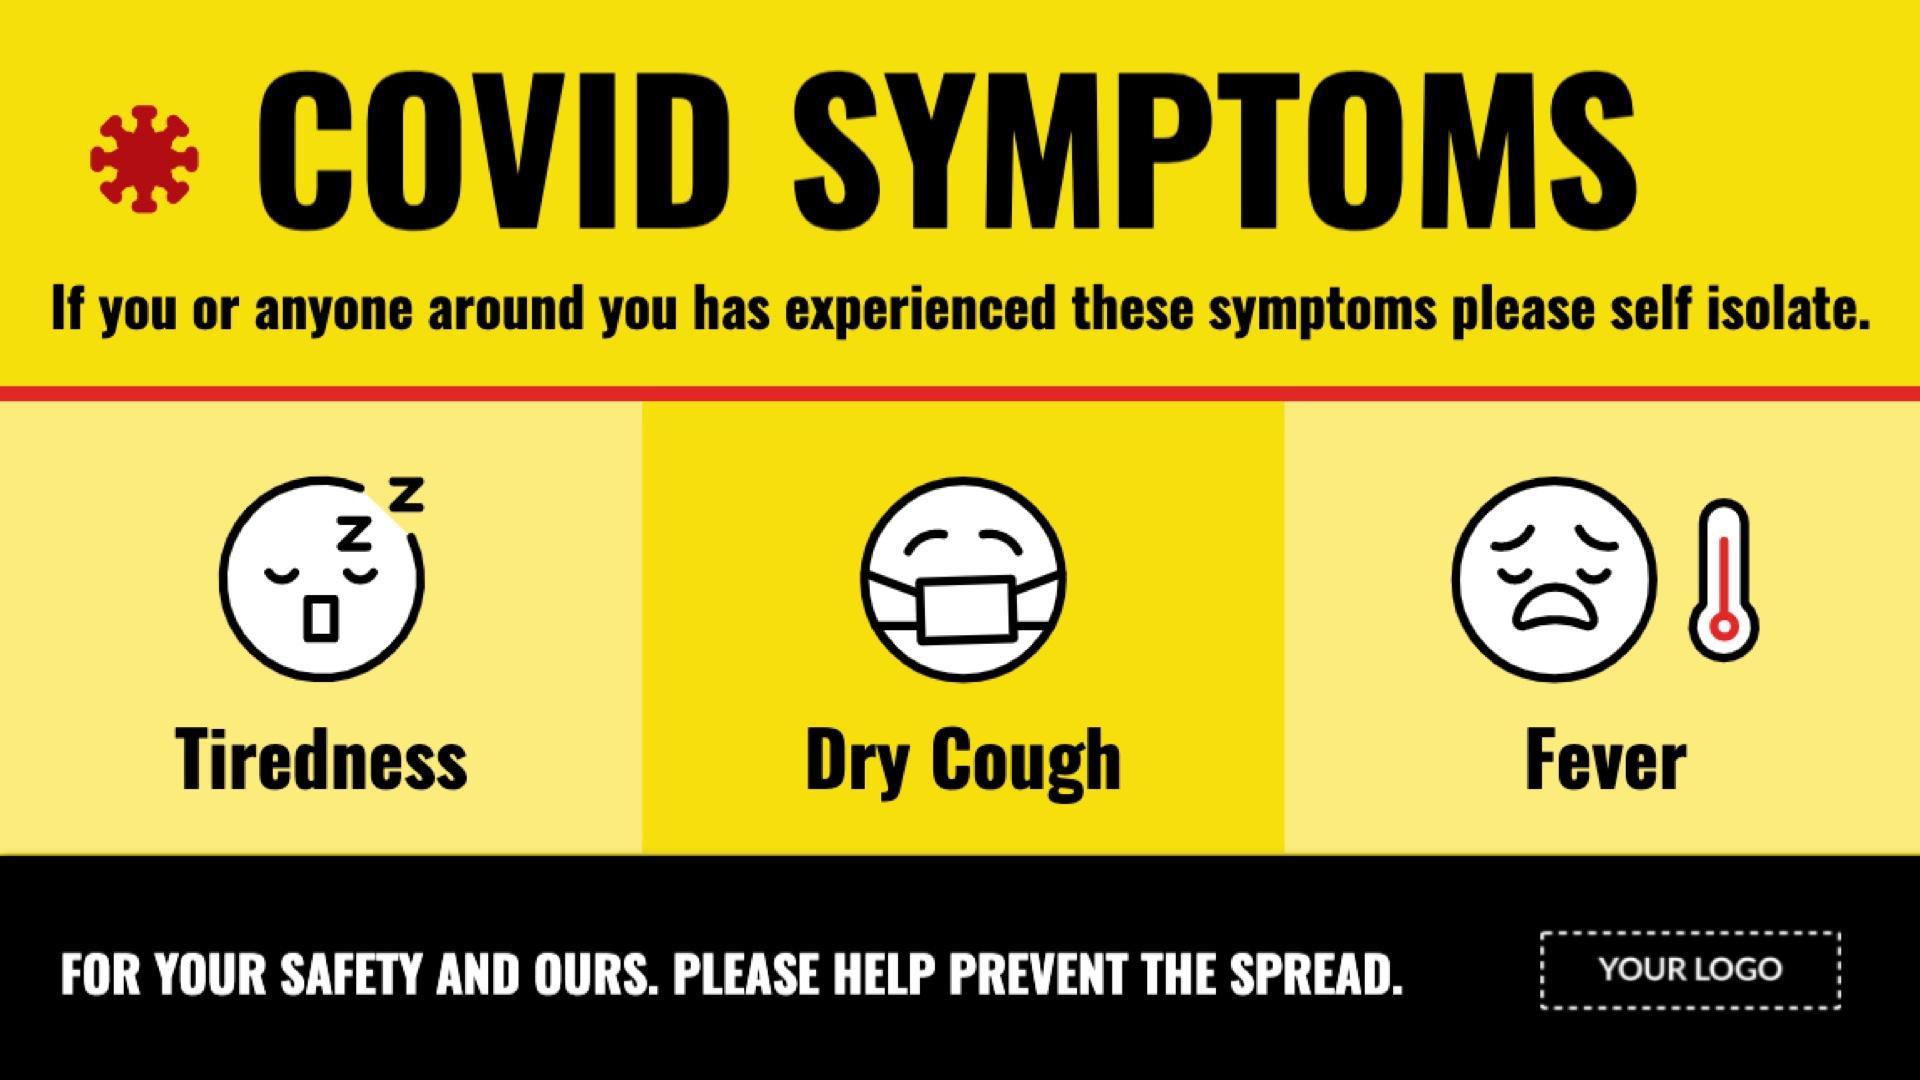 covid-19 symptoms digital signage template